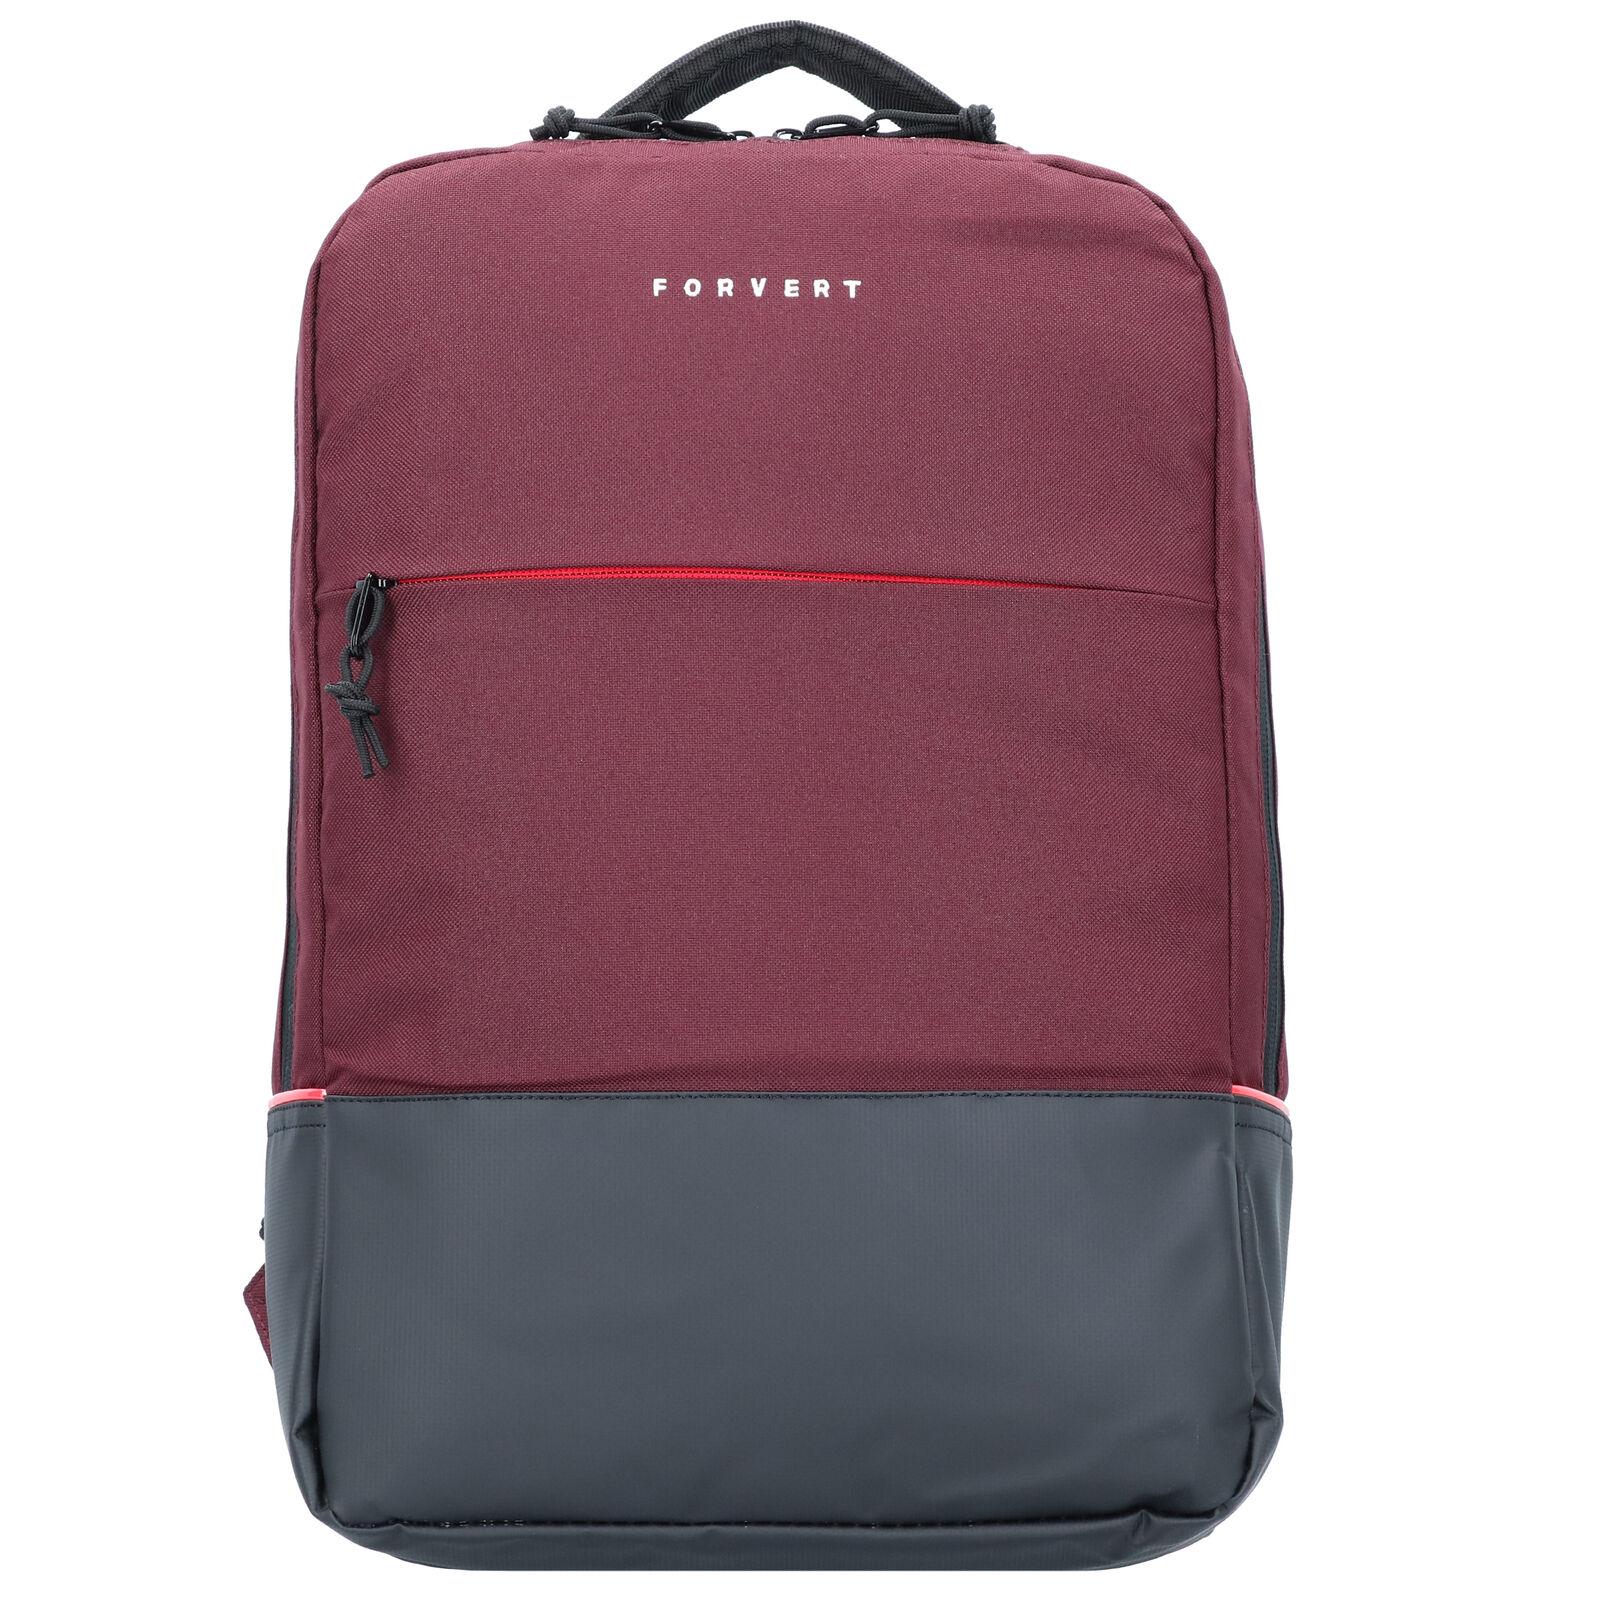 ForGrün Lance Rucksack Backpack Sport 42 cm Laptopfach (plum)